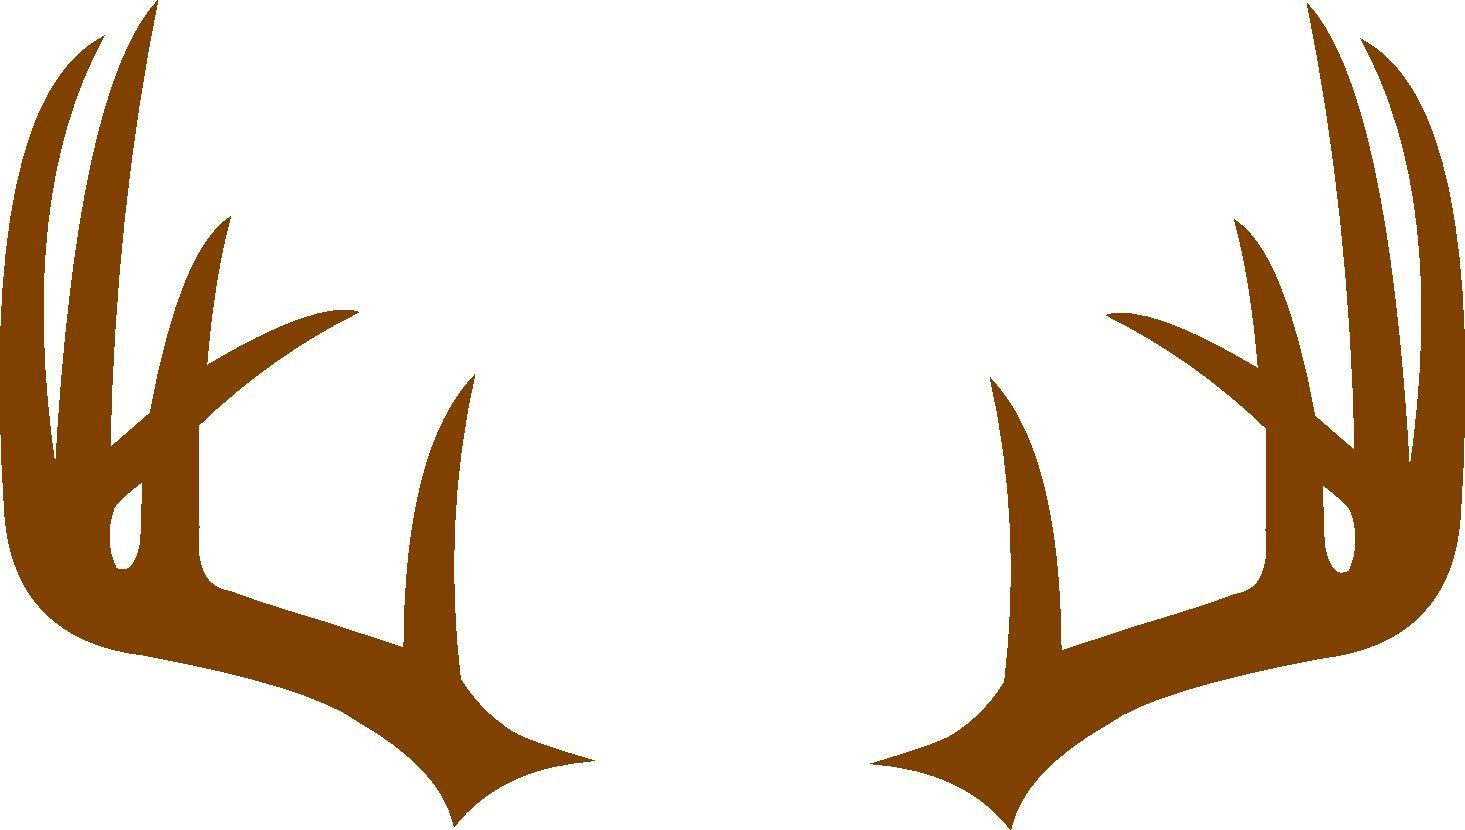 Deer Antler Monogram Frame SVG   Cameo Silhouette and SVG files ...